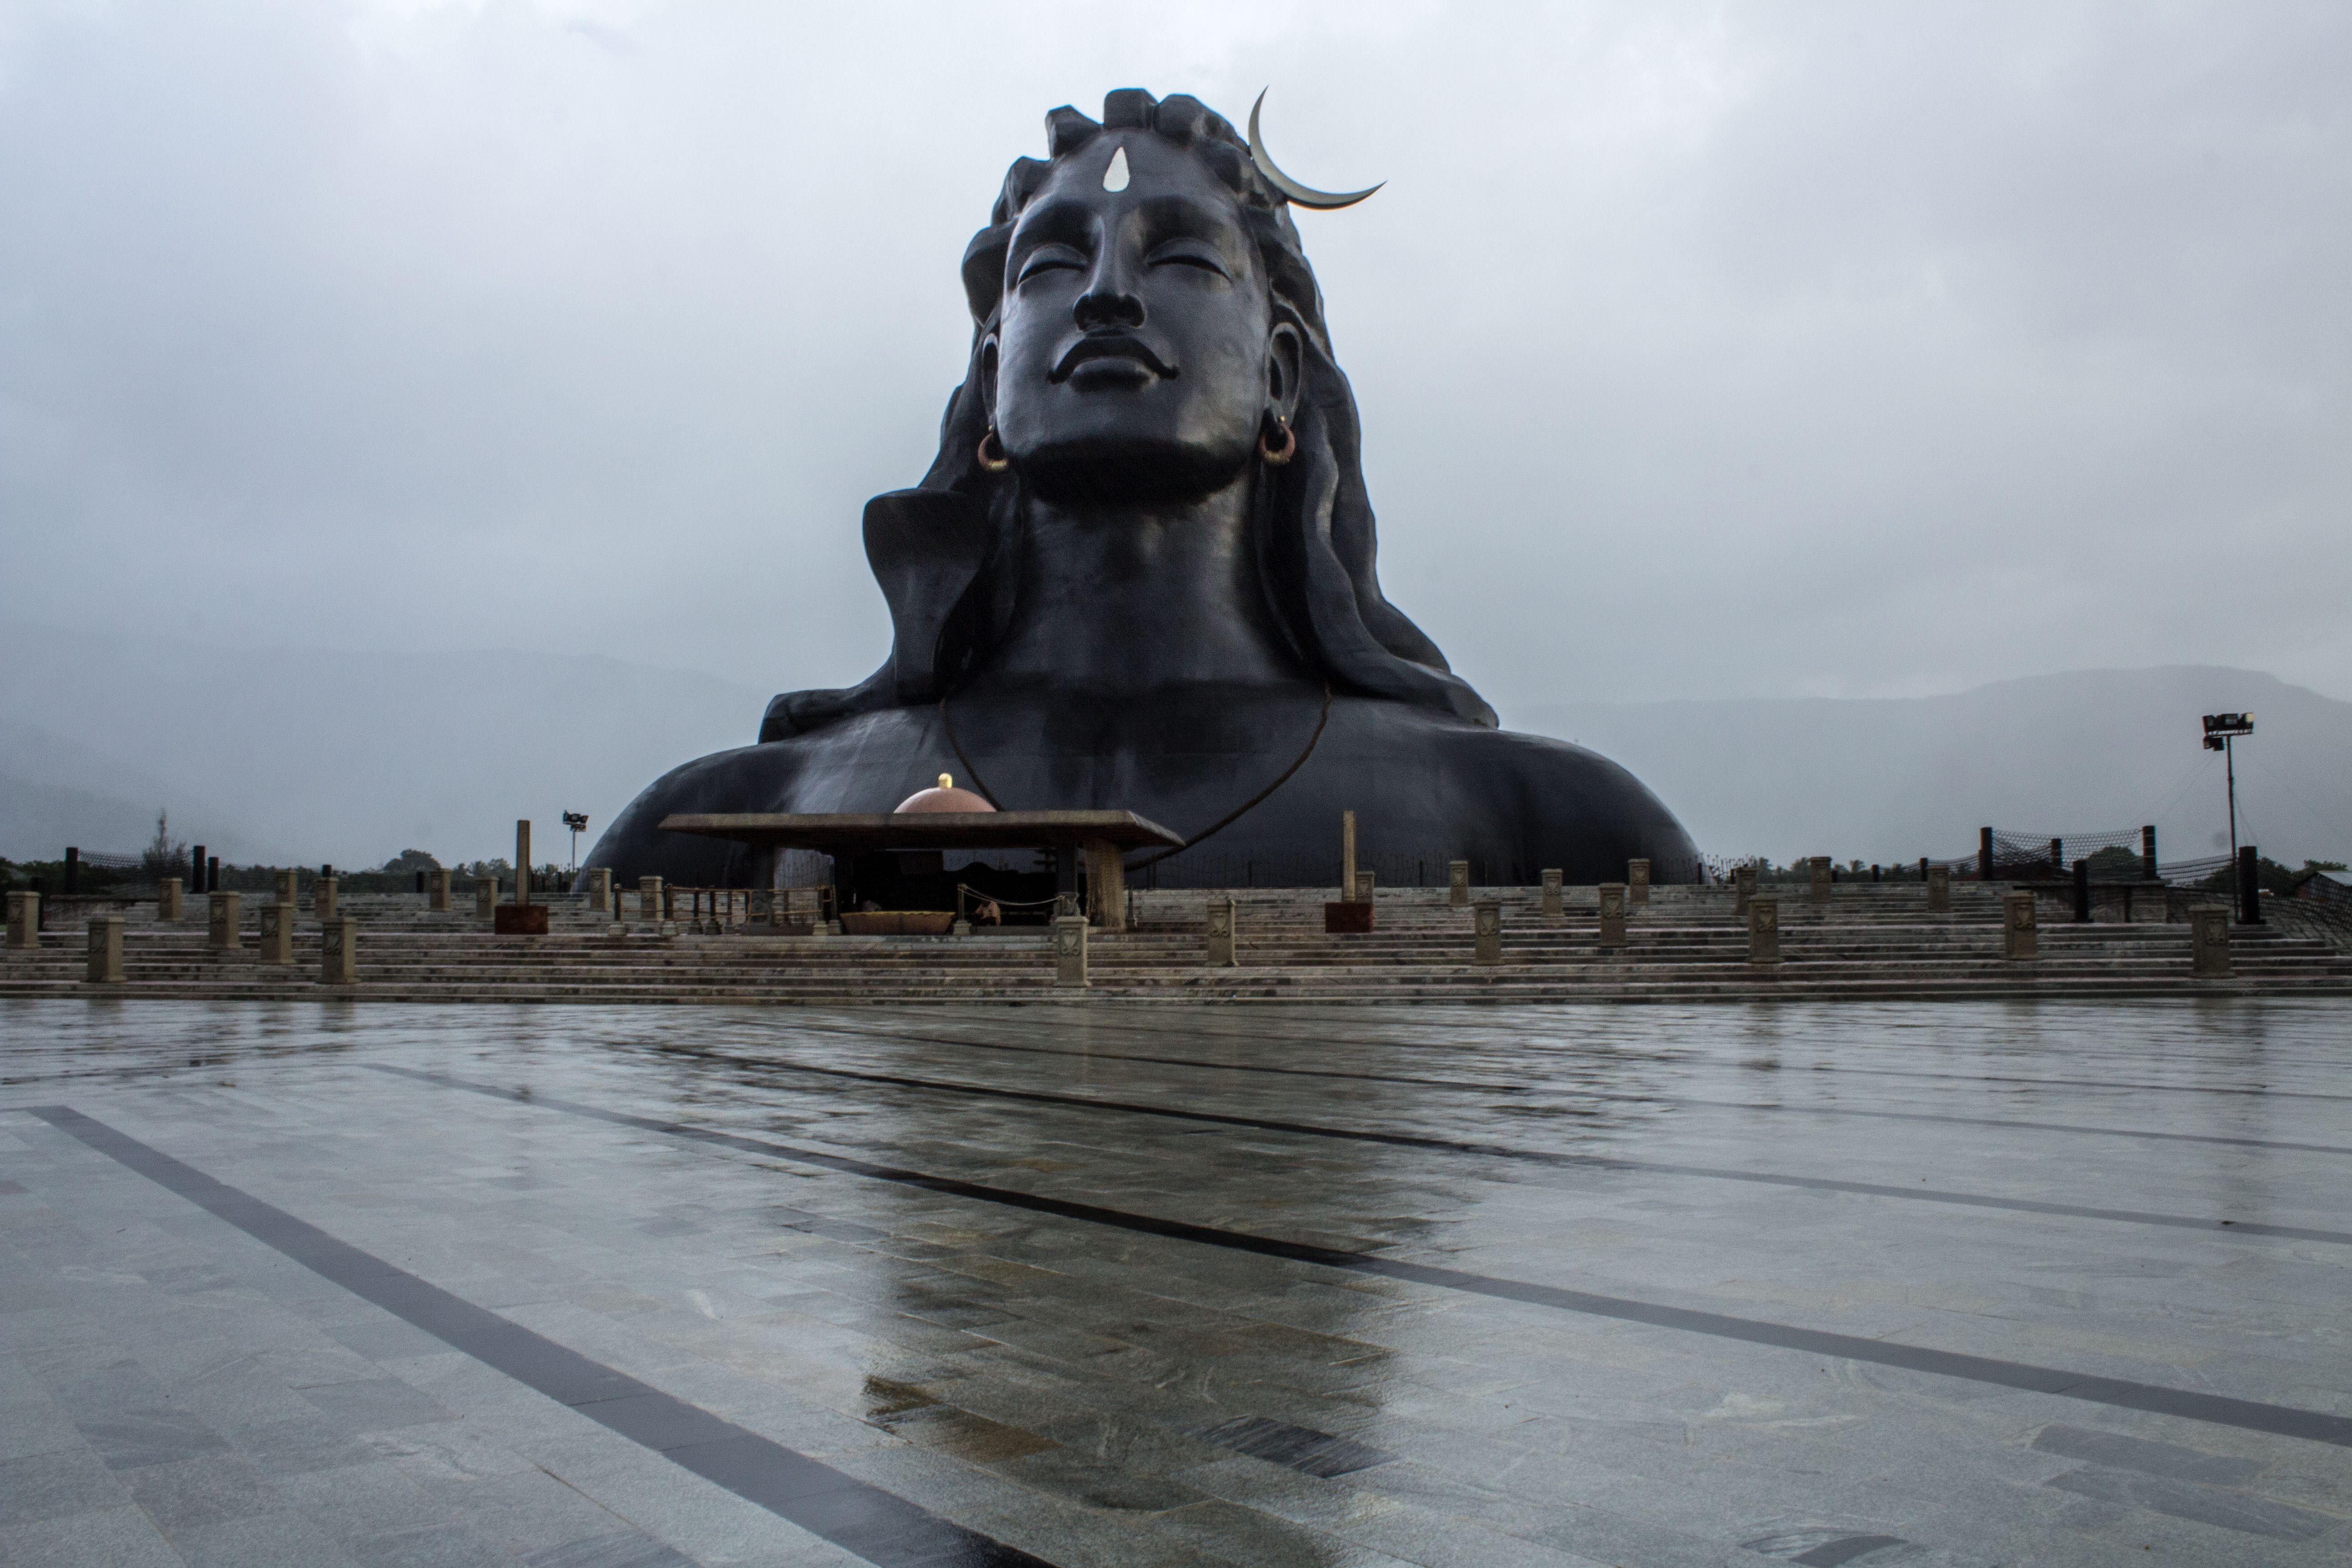 60 Shiva Adiyogi Wallpapers Hd Free Download For Mobile And Desktop Shiva Isha Yoga Guinness Book Of World Records